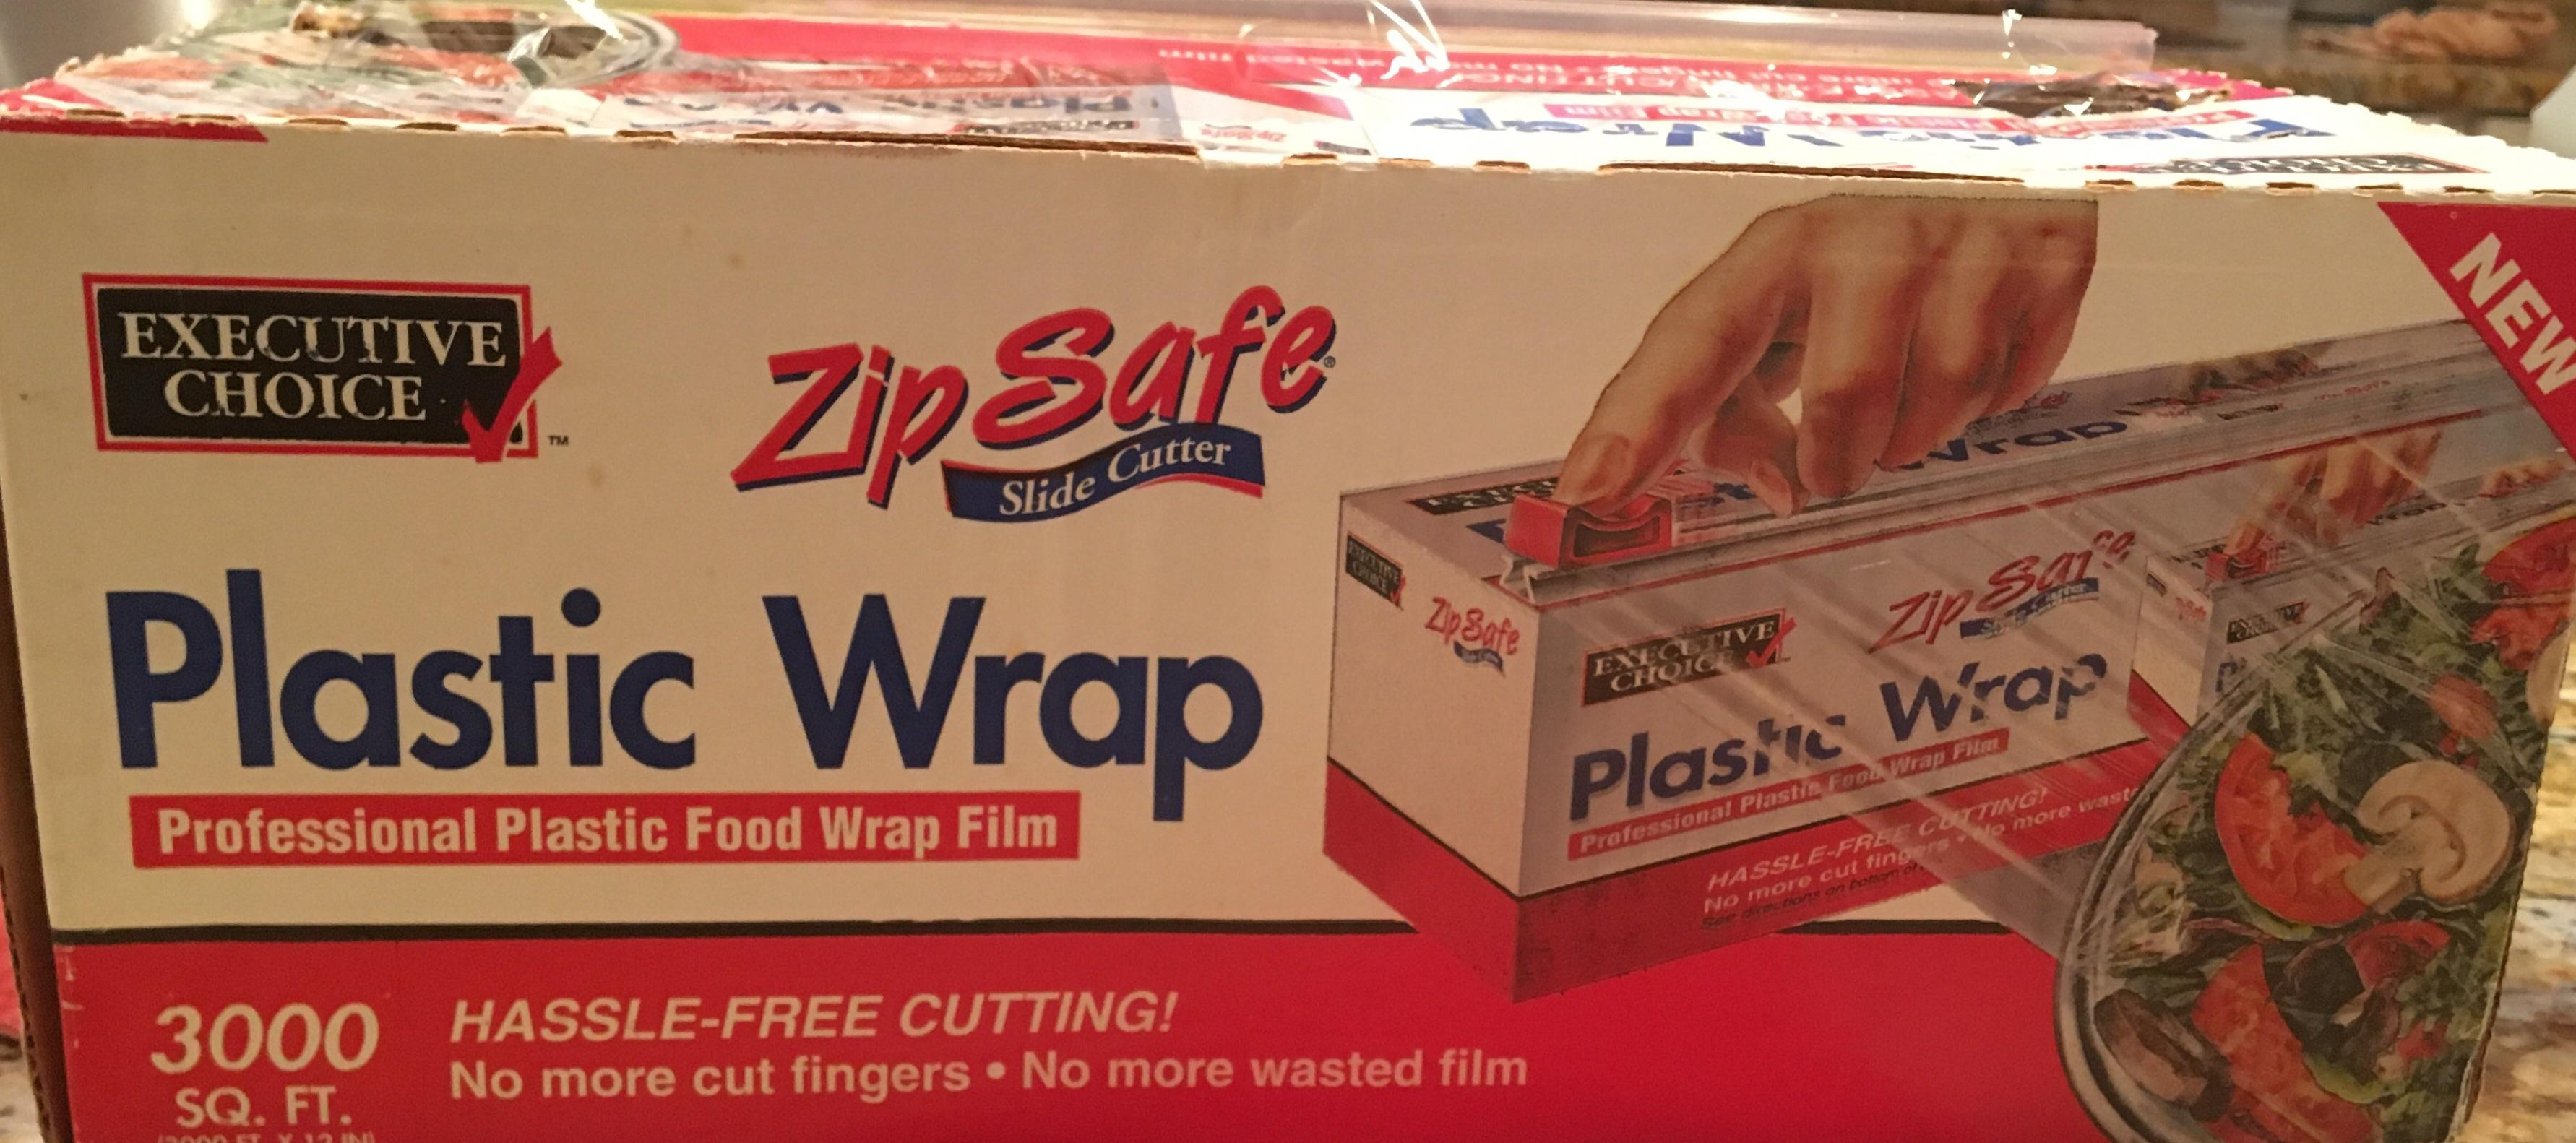 this plastic wrap box